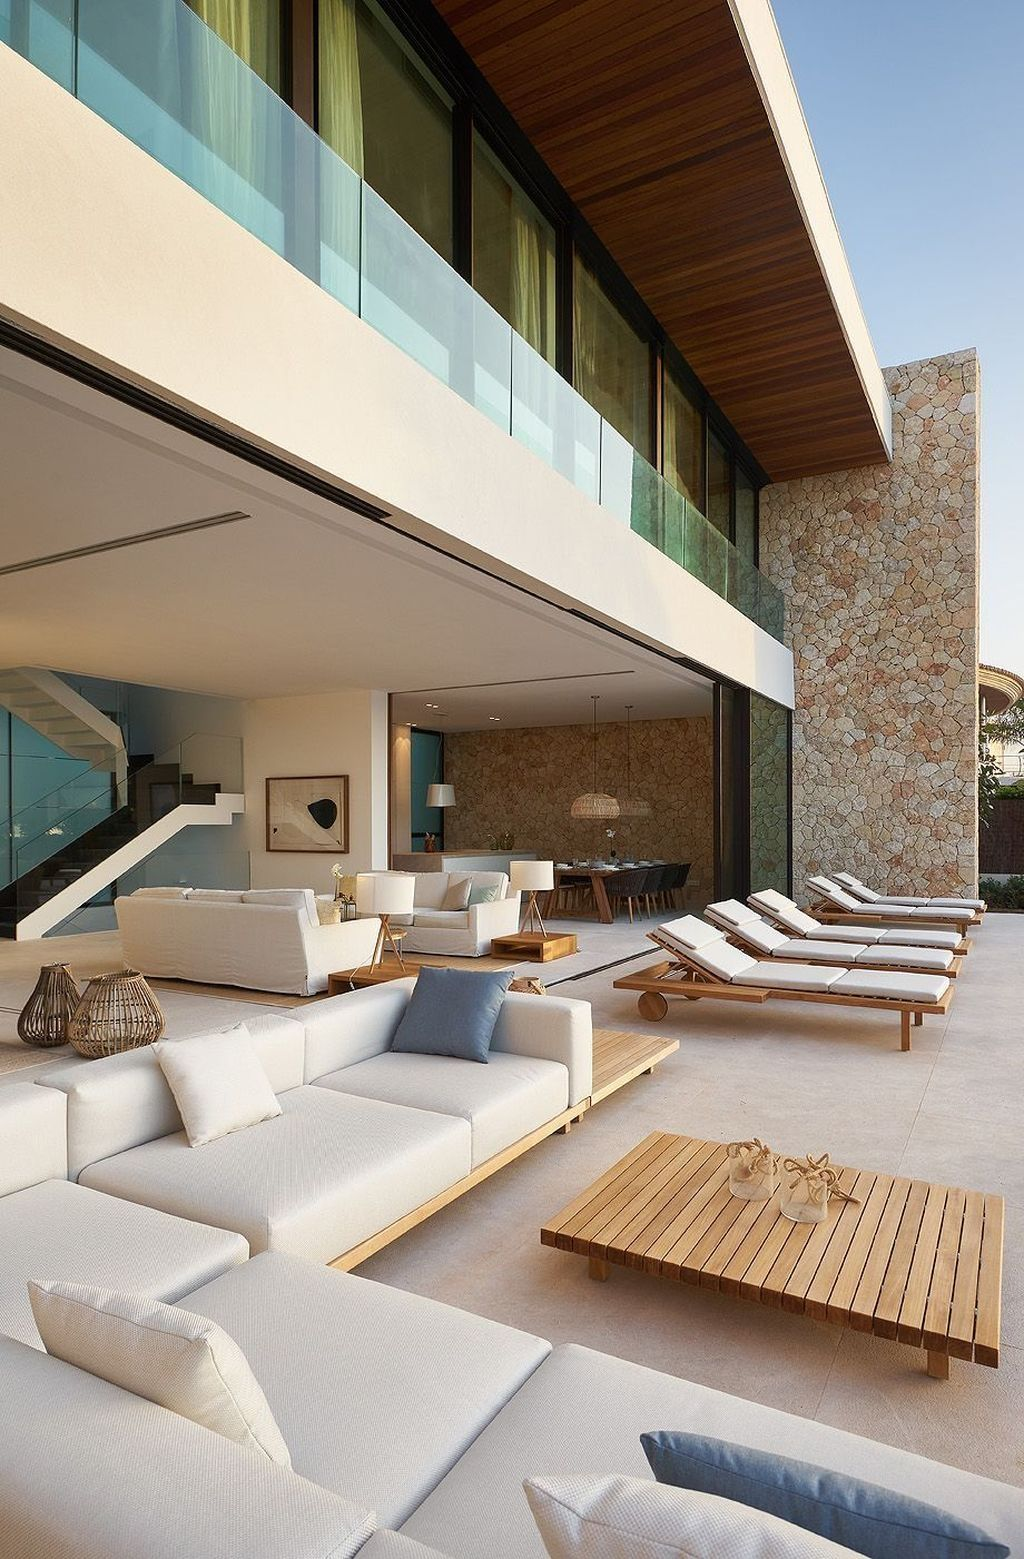 41 Stunning Contemporary Home Exterior Designs Ideas To Try Contemporary House Exterior Contemporary House Design Contemporary House